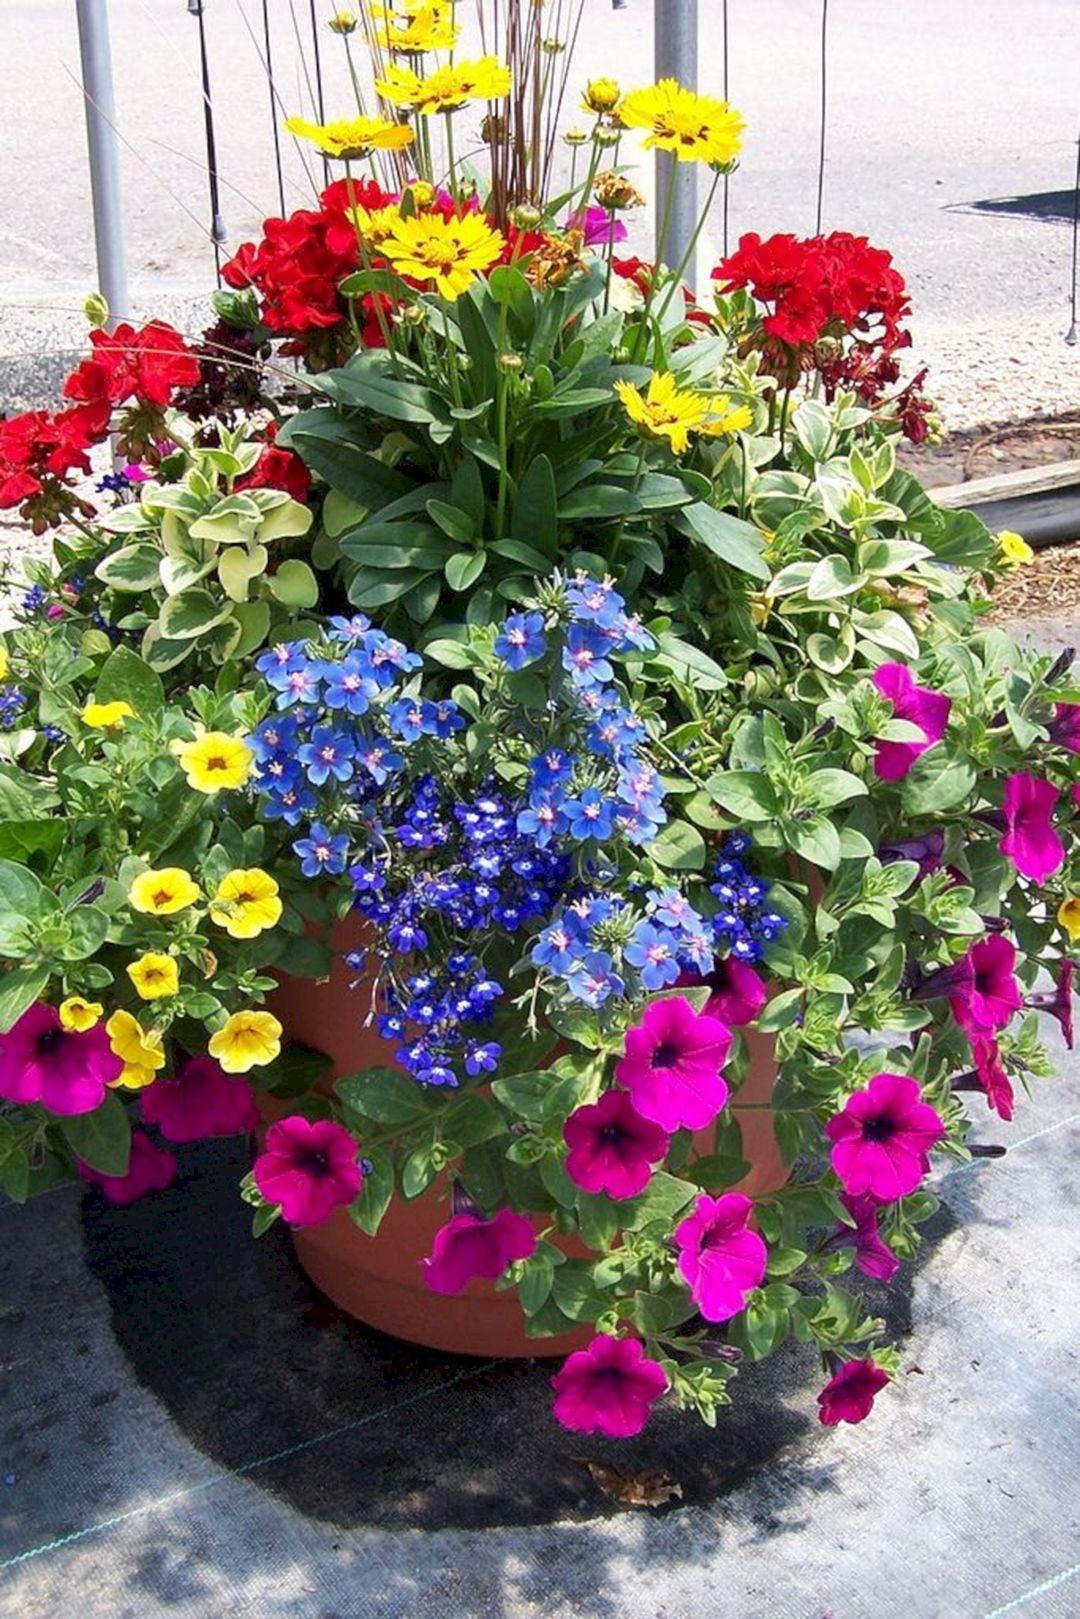 Phenomenal best container gardening design flowers ideas 25 phenomenal best container gardening design flowers ideas 25 beautiful container gardening picture https izmirmasajfo